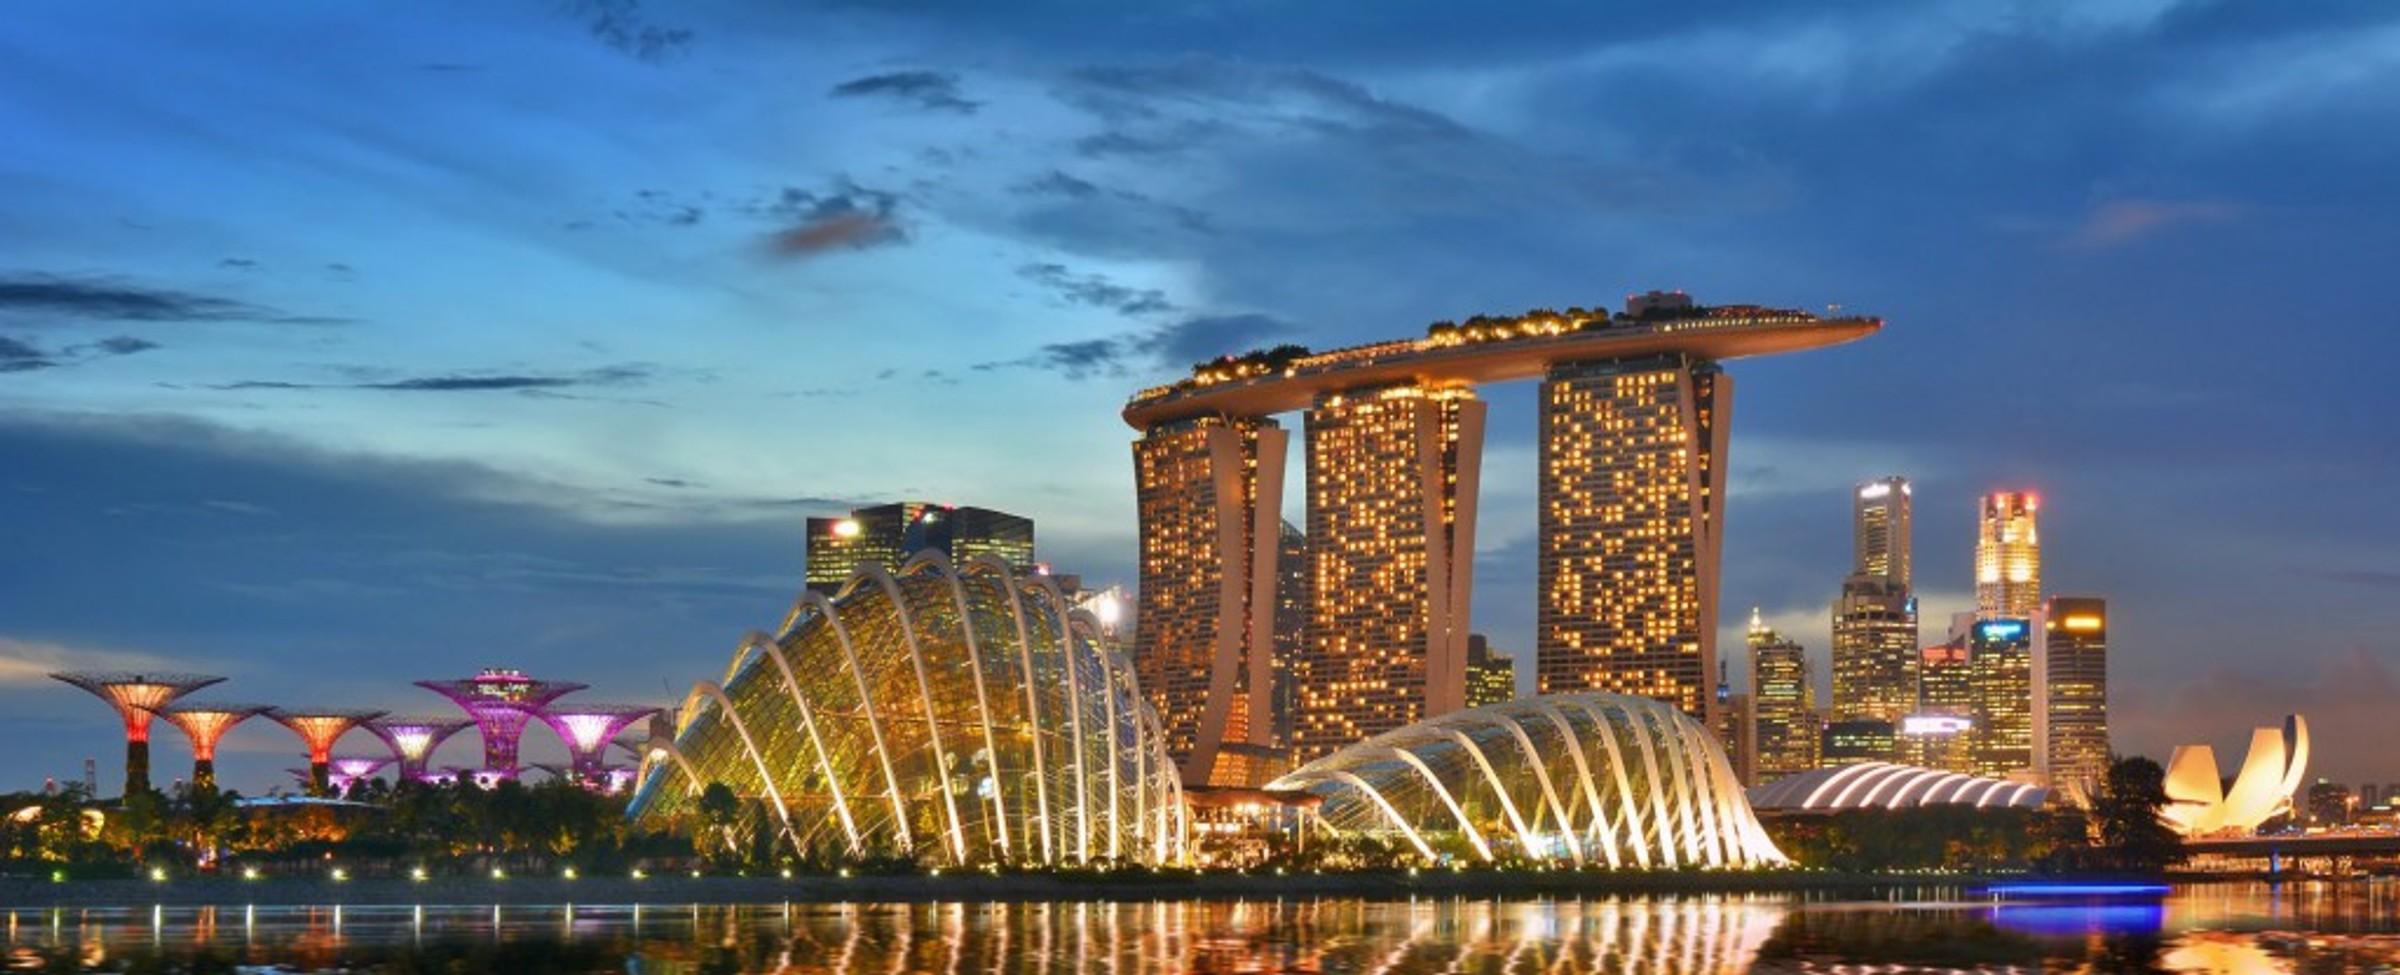 Singapur ve filmu